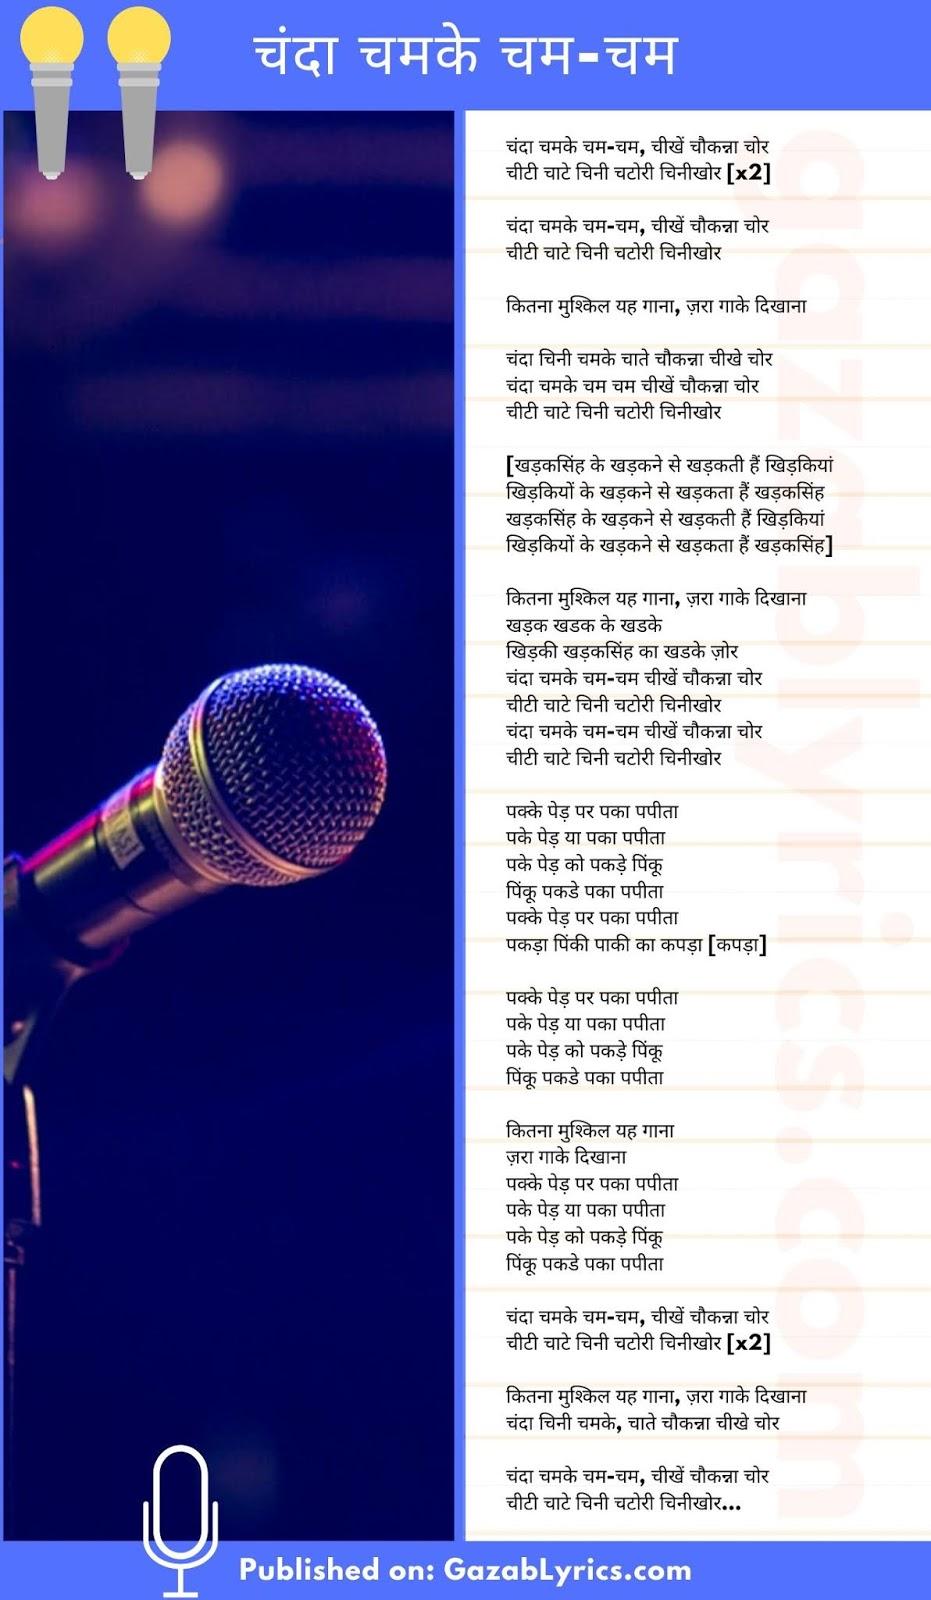 Chanda Chamke song lyrics image